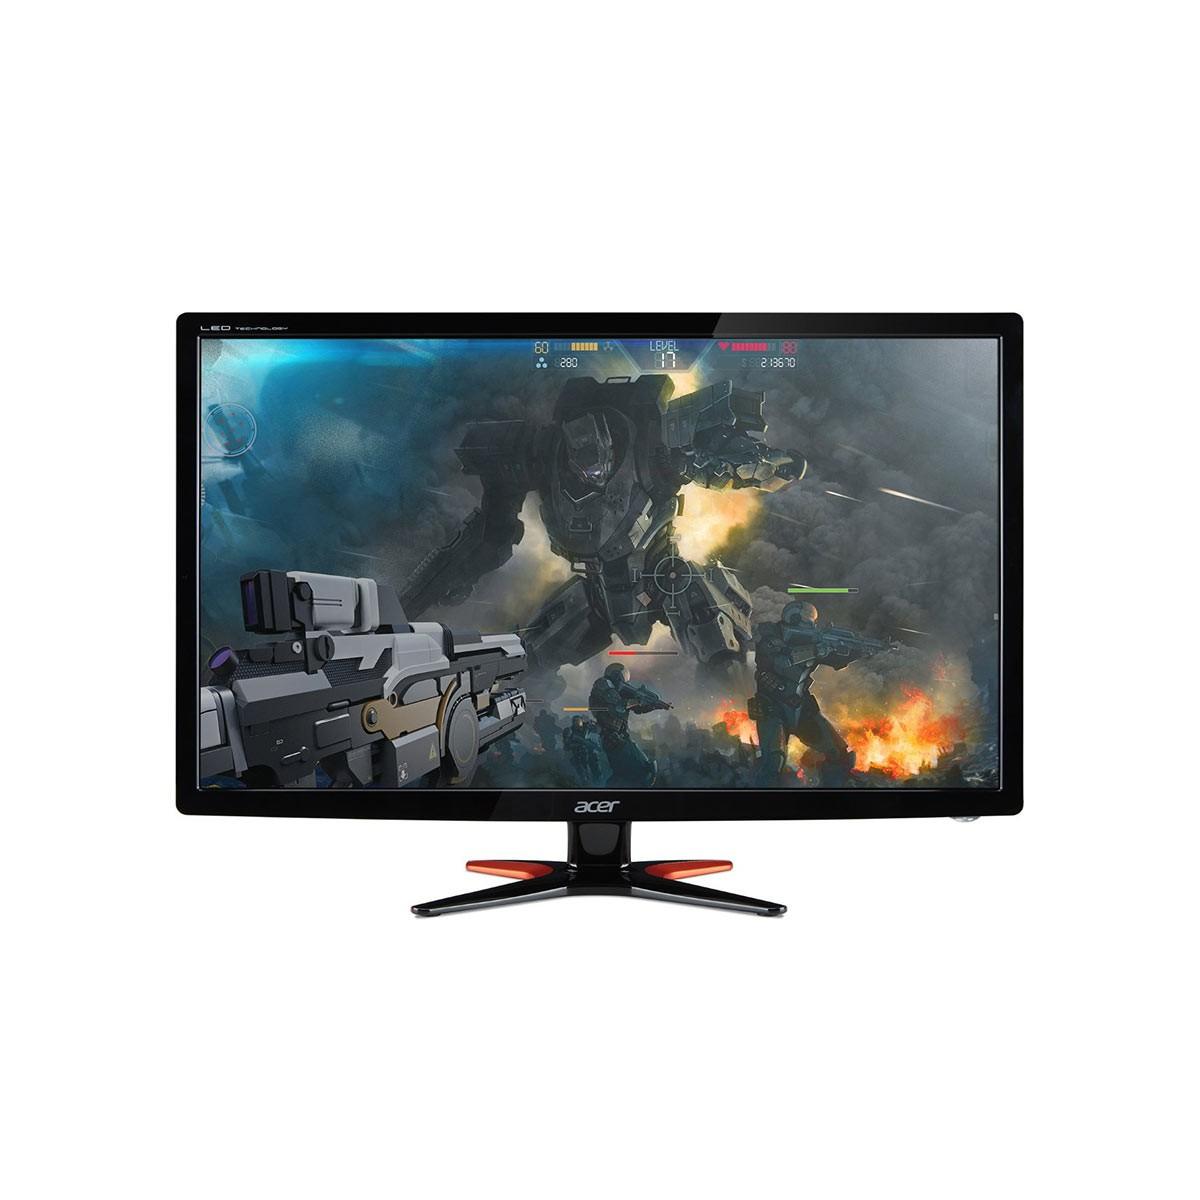 X329BV-SR 23-Inch 1920p LED Monitor (2018 Model) Ultra Base System